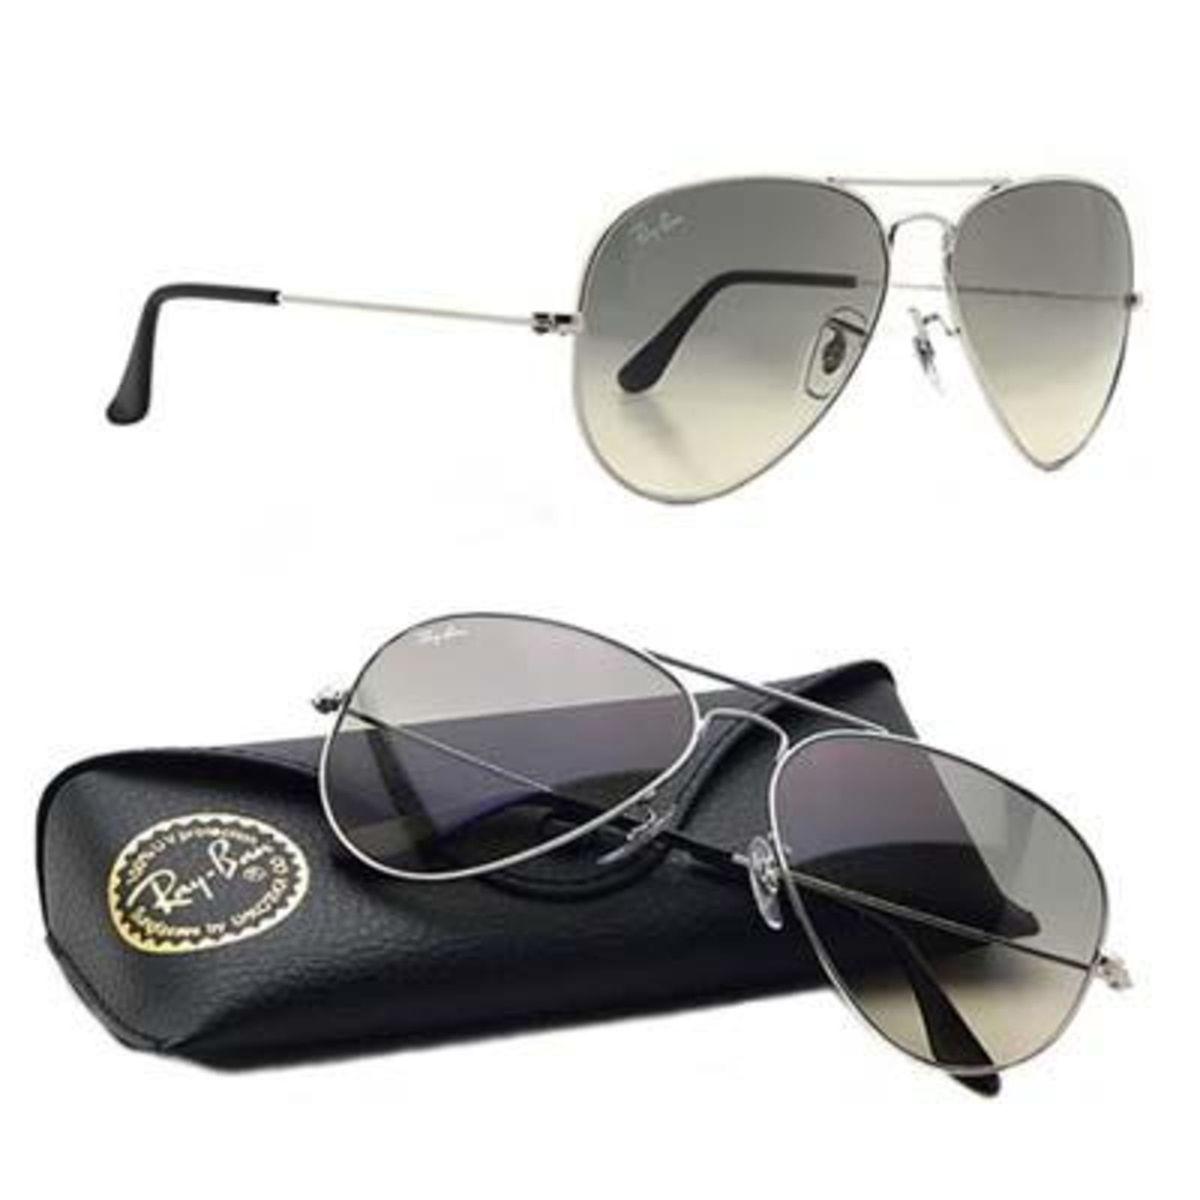 2456b0b582faf Aviador Prata Fume Degrade Médio   Óculos Masculino Ray Ban Nunca ...